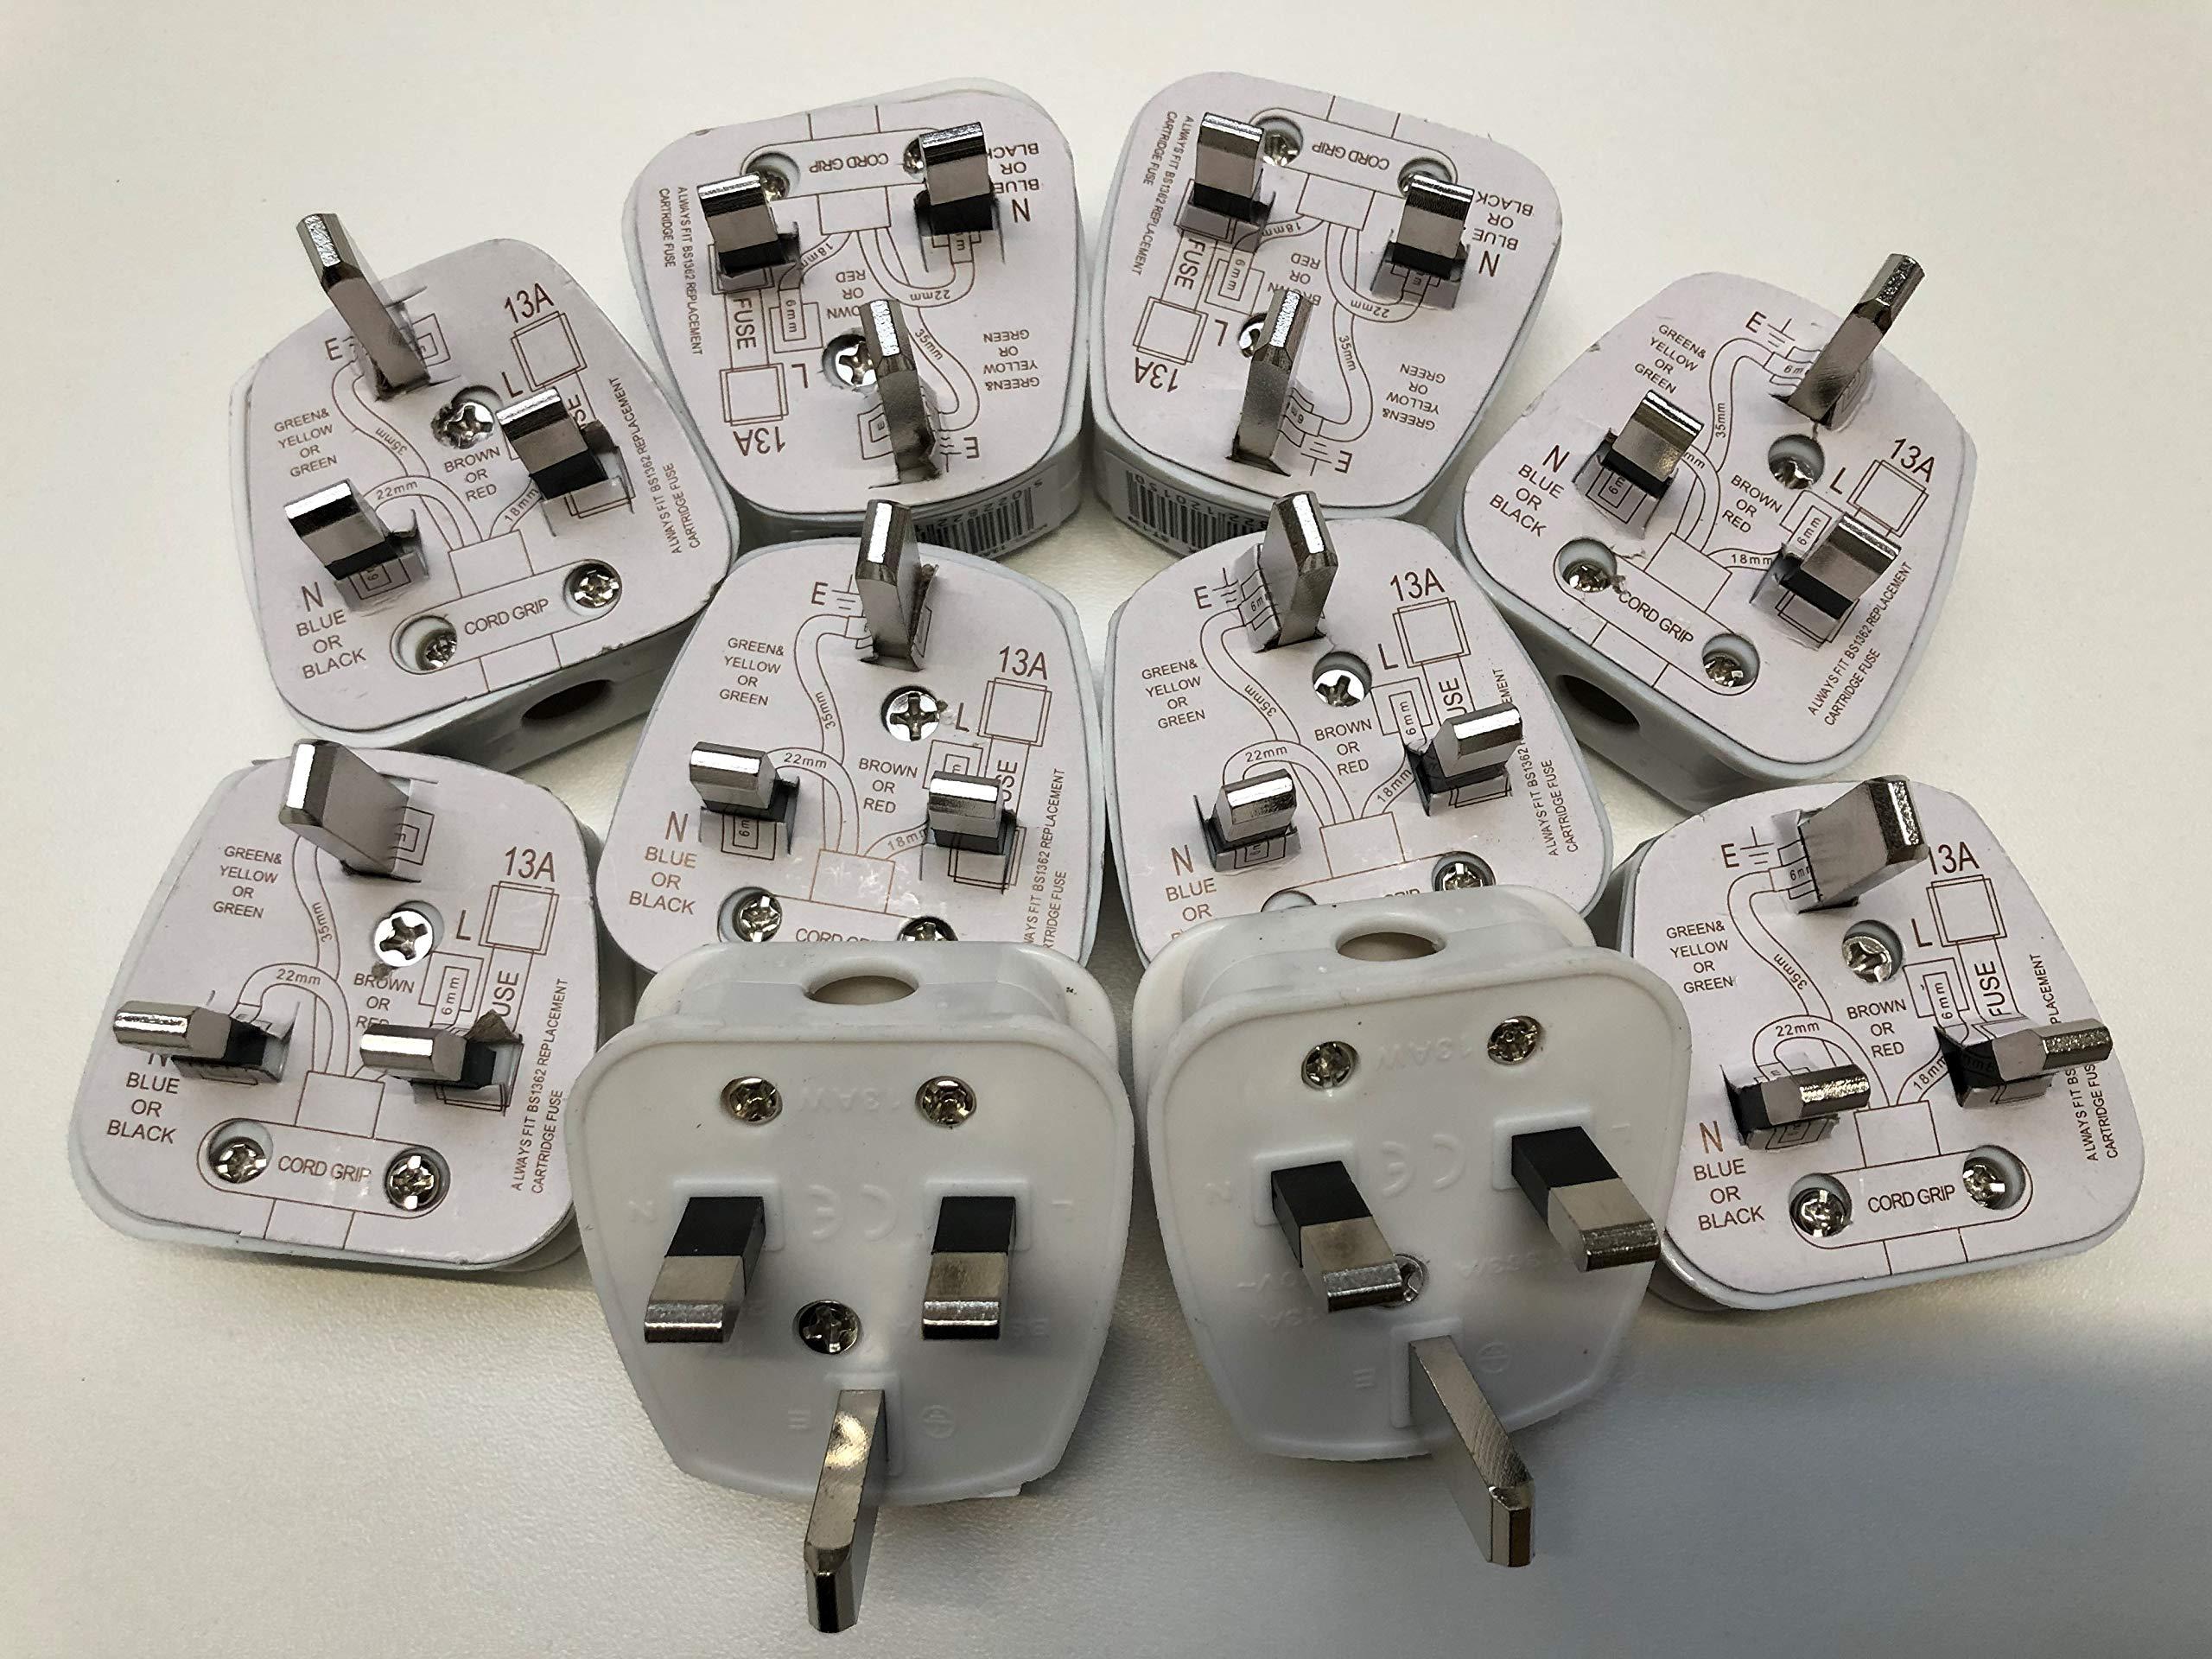 13 AMP Pack of 10 Nartel® BS1362 Fuse Cartridge 13 amp